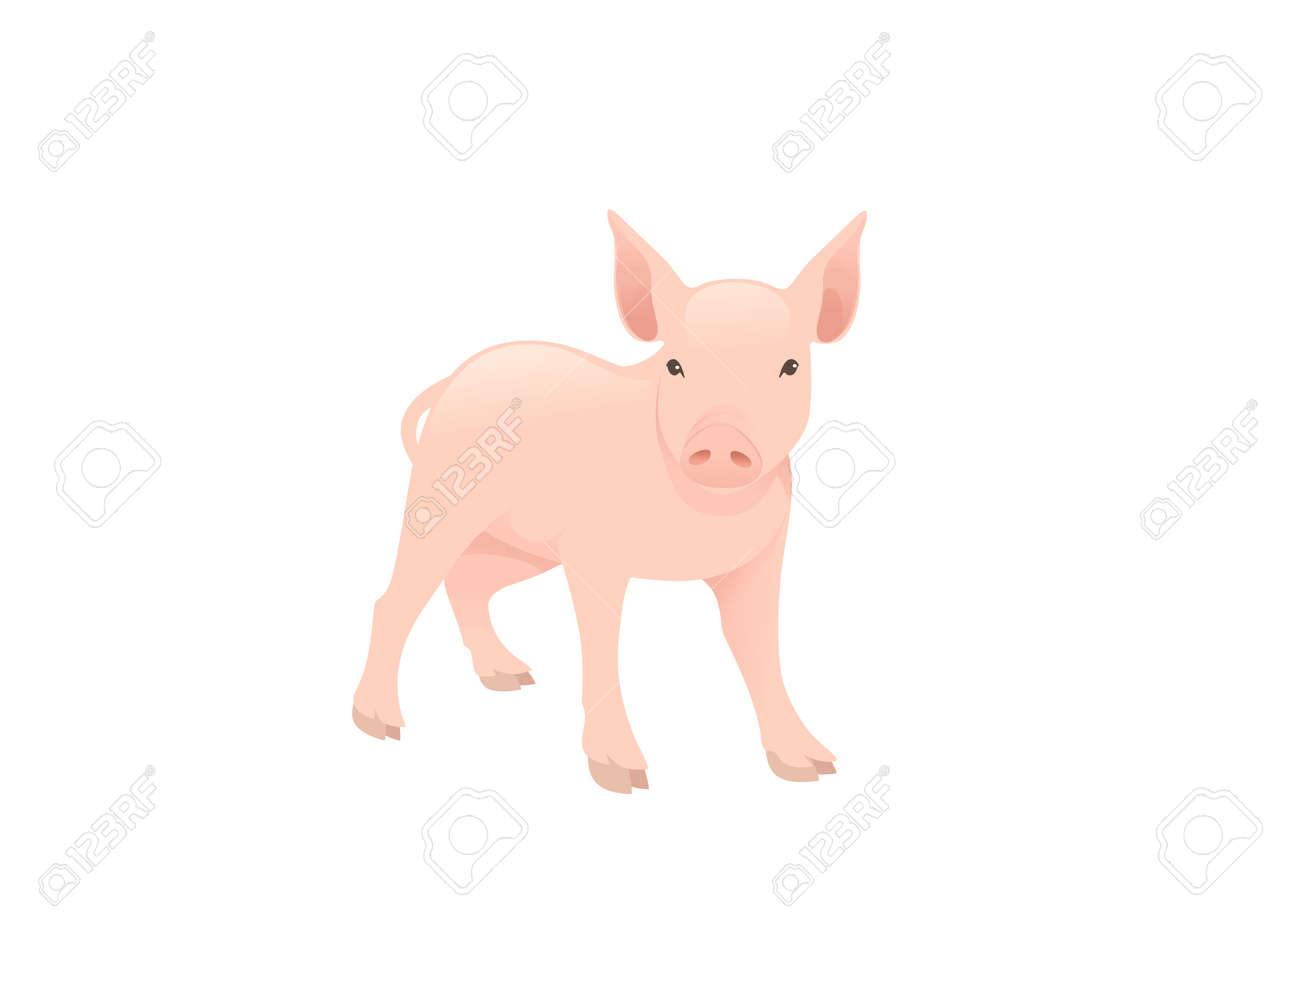 Cute adult pig farm animal cartoon animal design vector illustration isolated on white background - 168754770